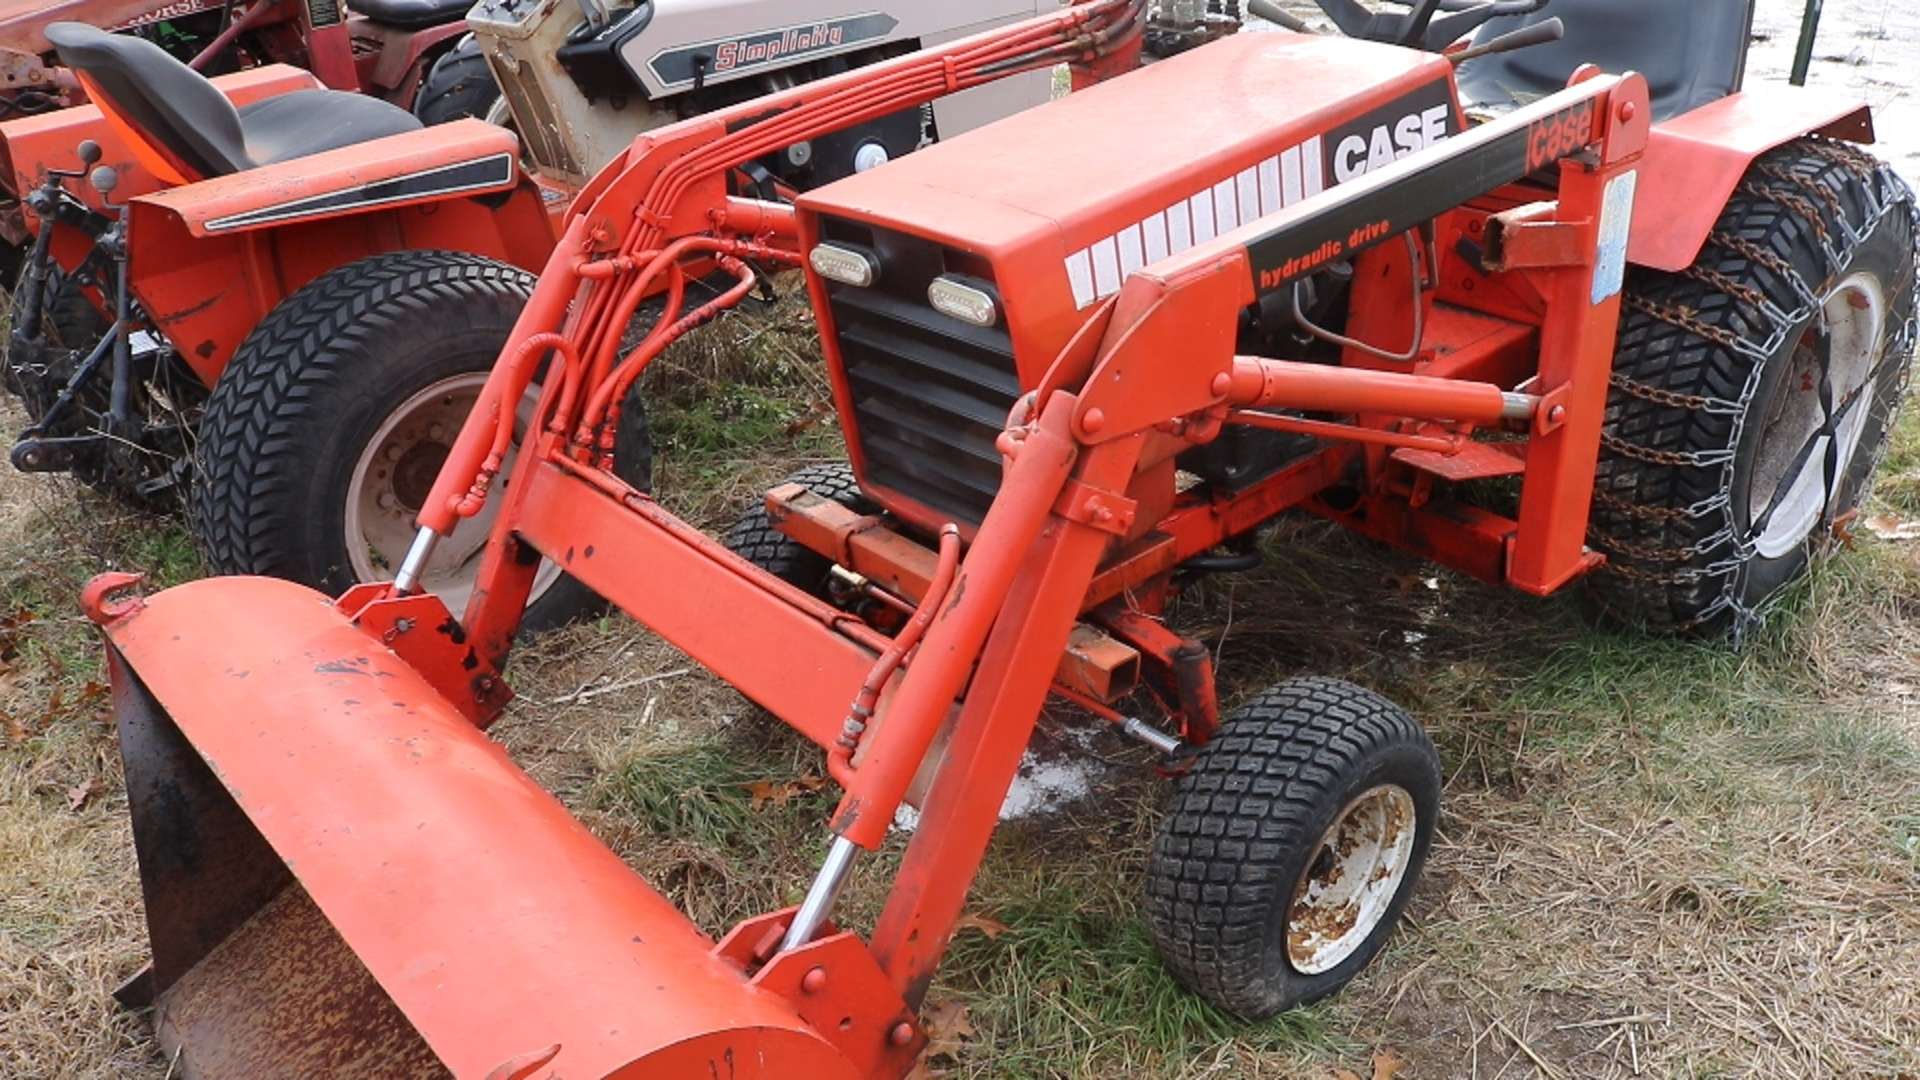 Best Vintage Garden Tractor For A Front End Loader Isavetractors